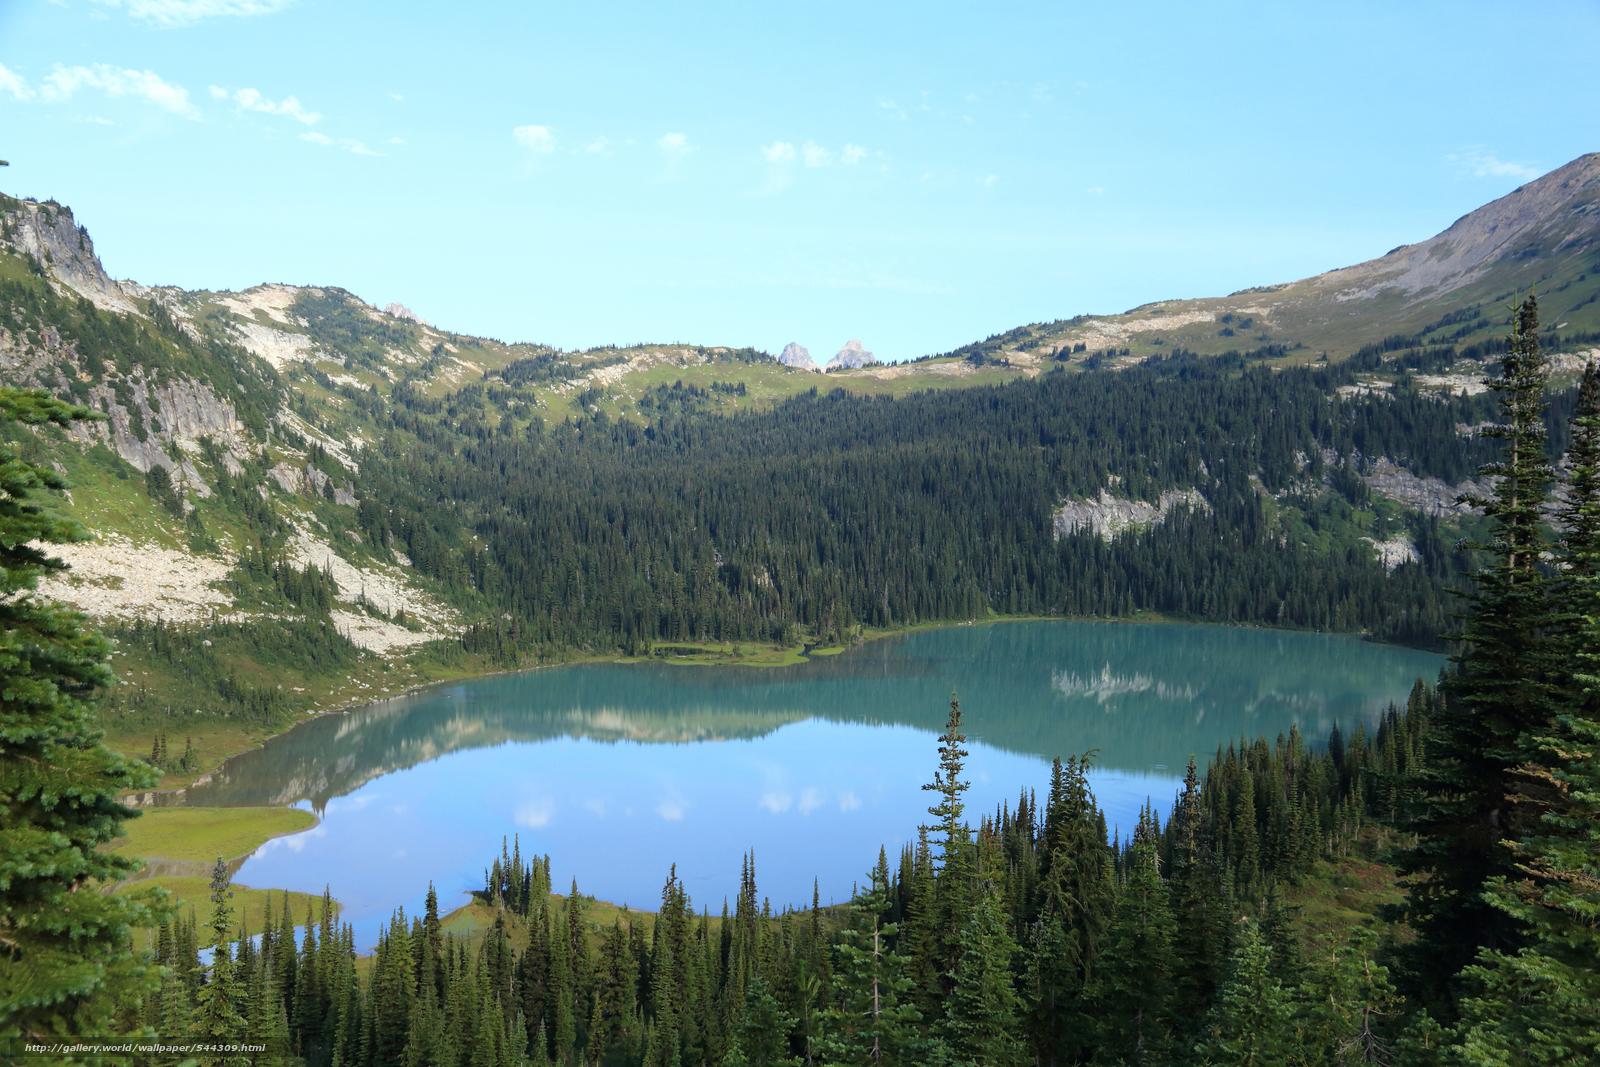 Download wallpaper Lyman Lake, Cloudy Pass, Sitting Bull Mountain